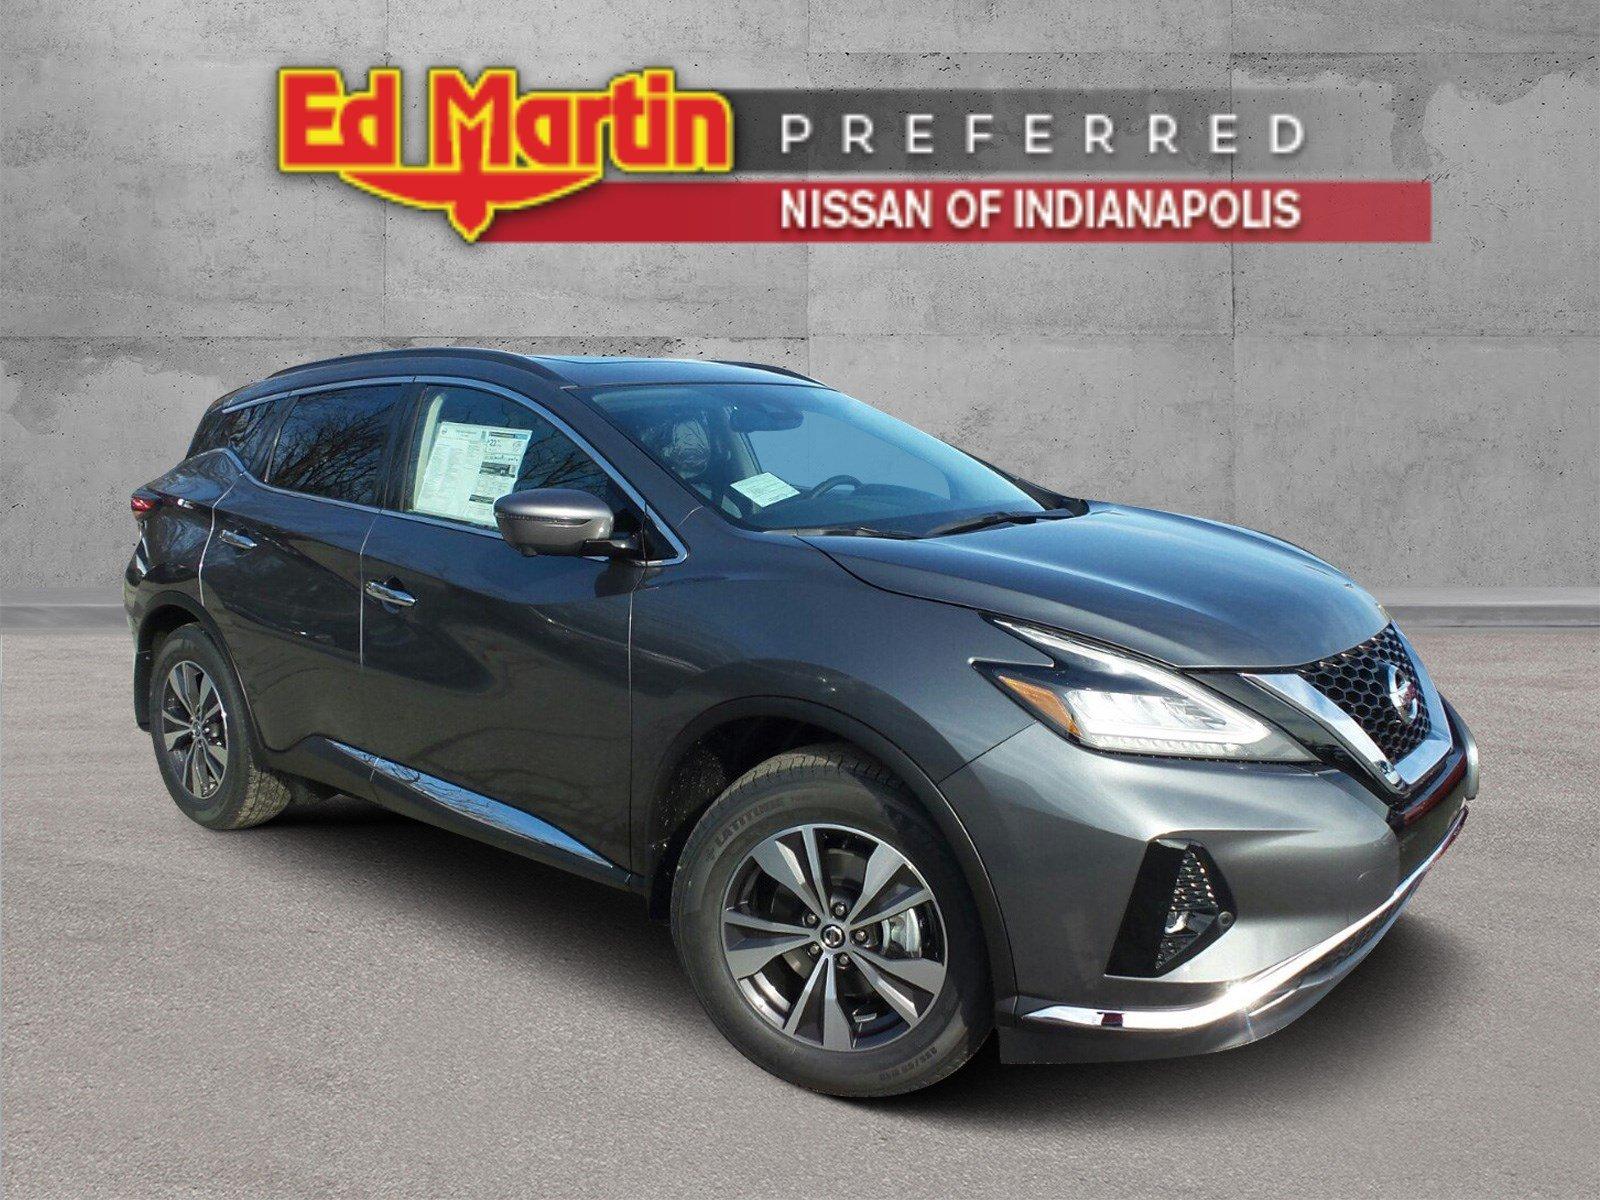 2019 Nissan Murano For Sale in Anderson IN | Ed Martin ...